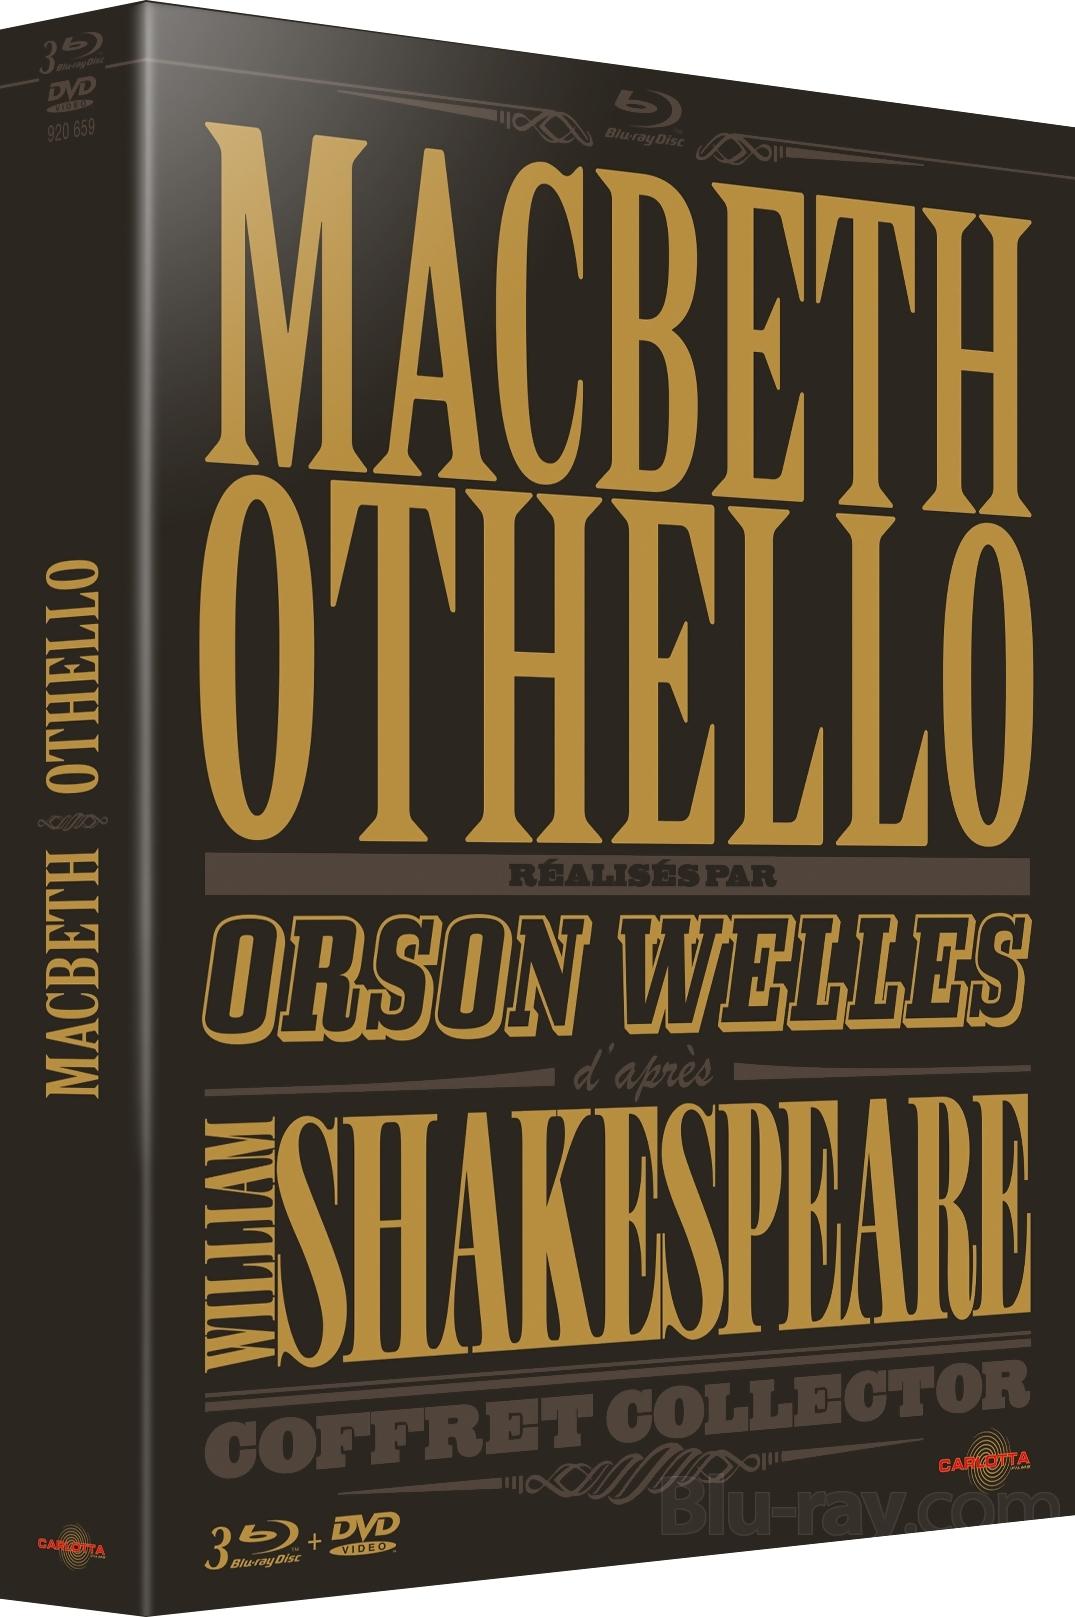 macbeth and othello